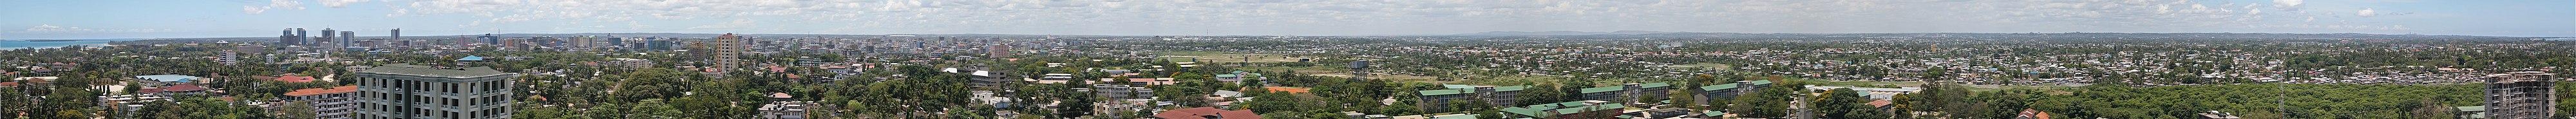 Dar es Salaam Panorama edit2.jpg